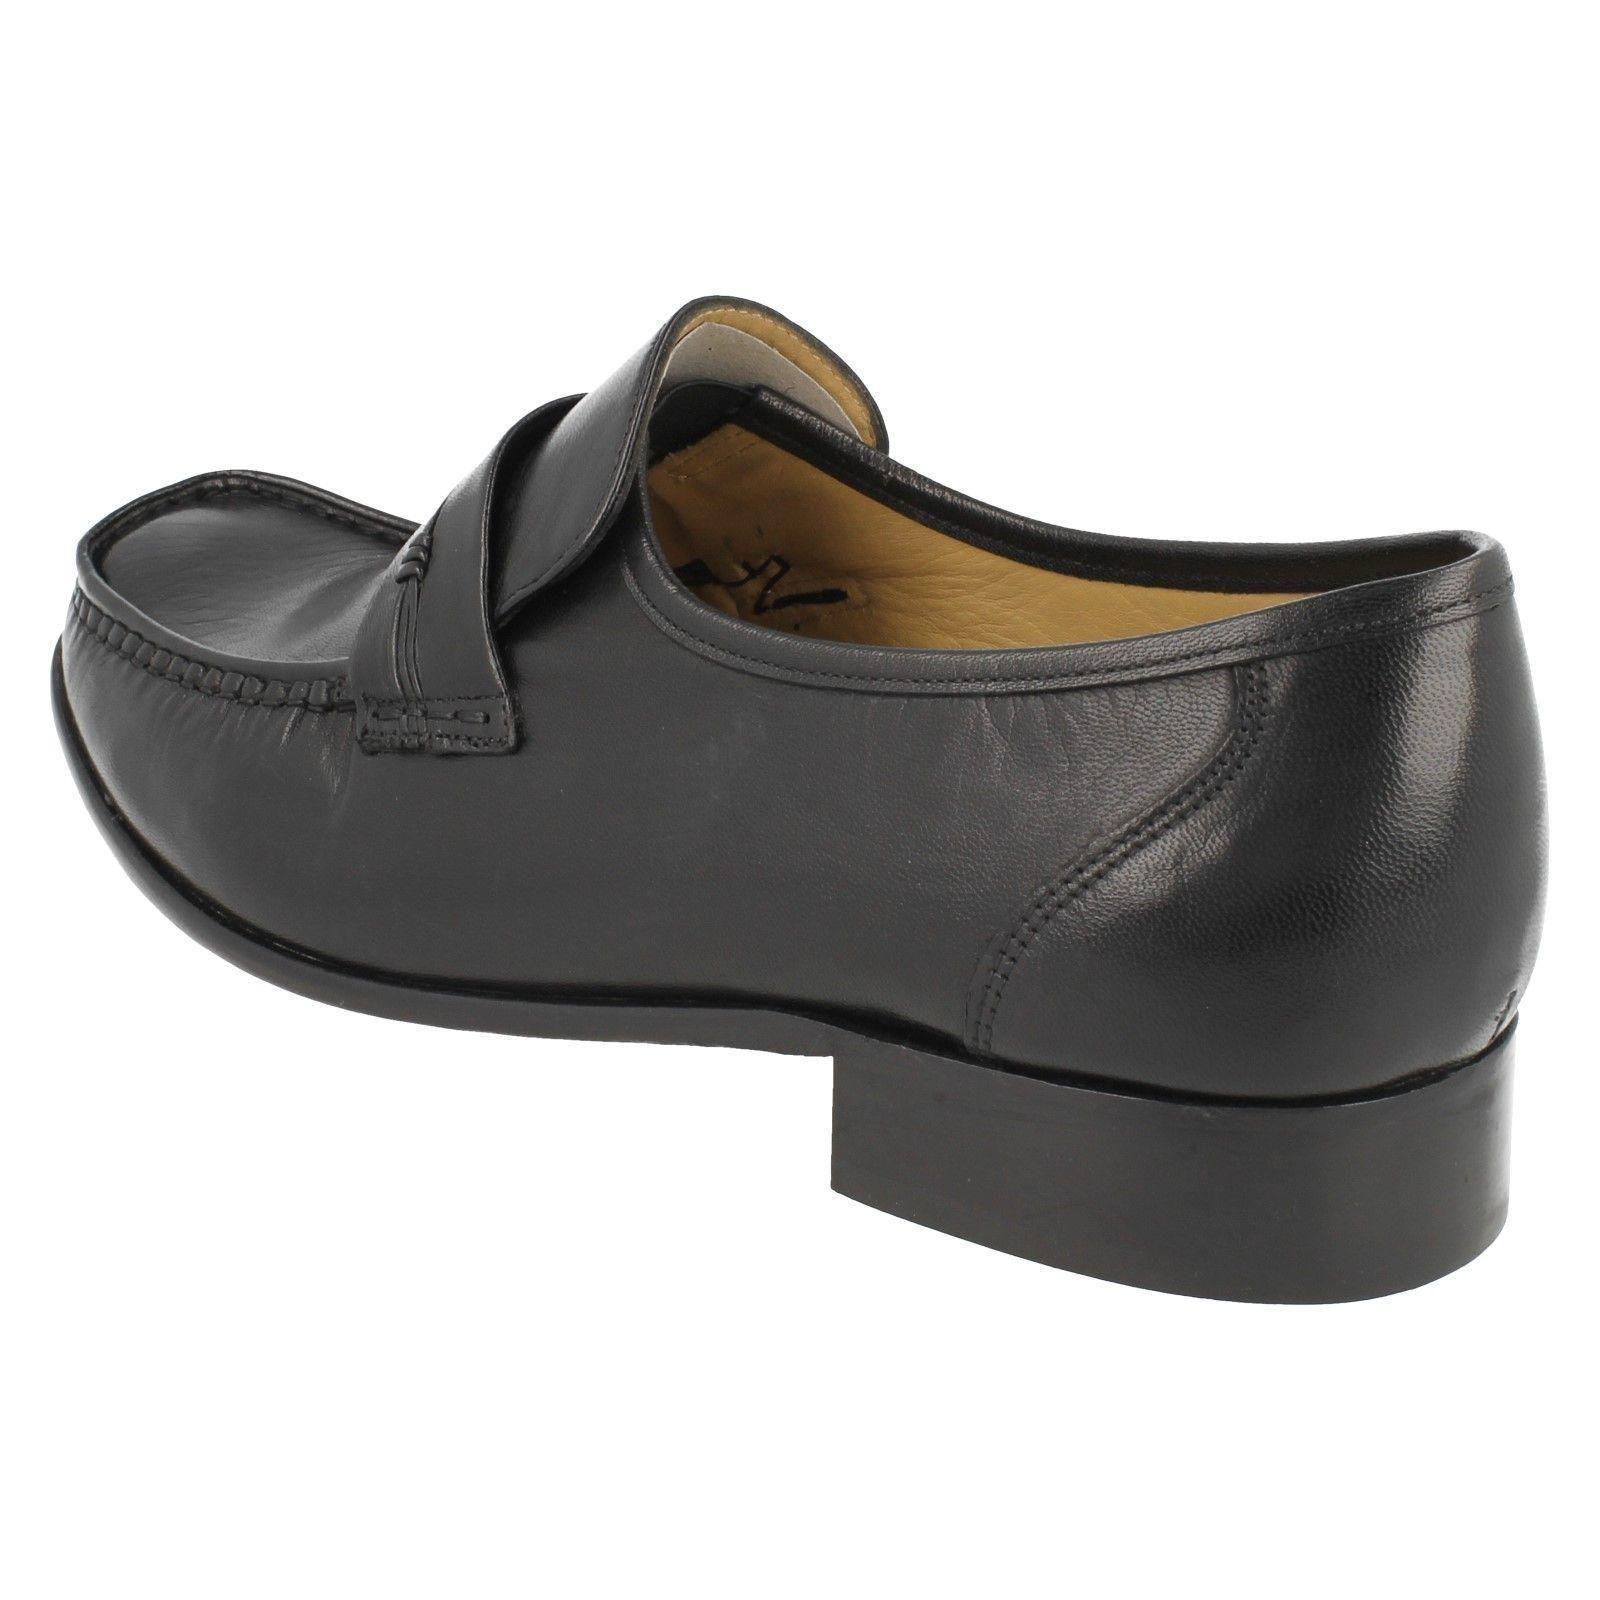 Moccasin Herren Thomas Blunt Leder Classic Moccasin  Slip On Schuhes Clapham 39a35e